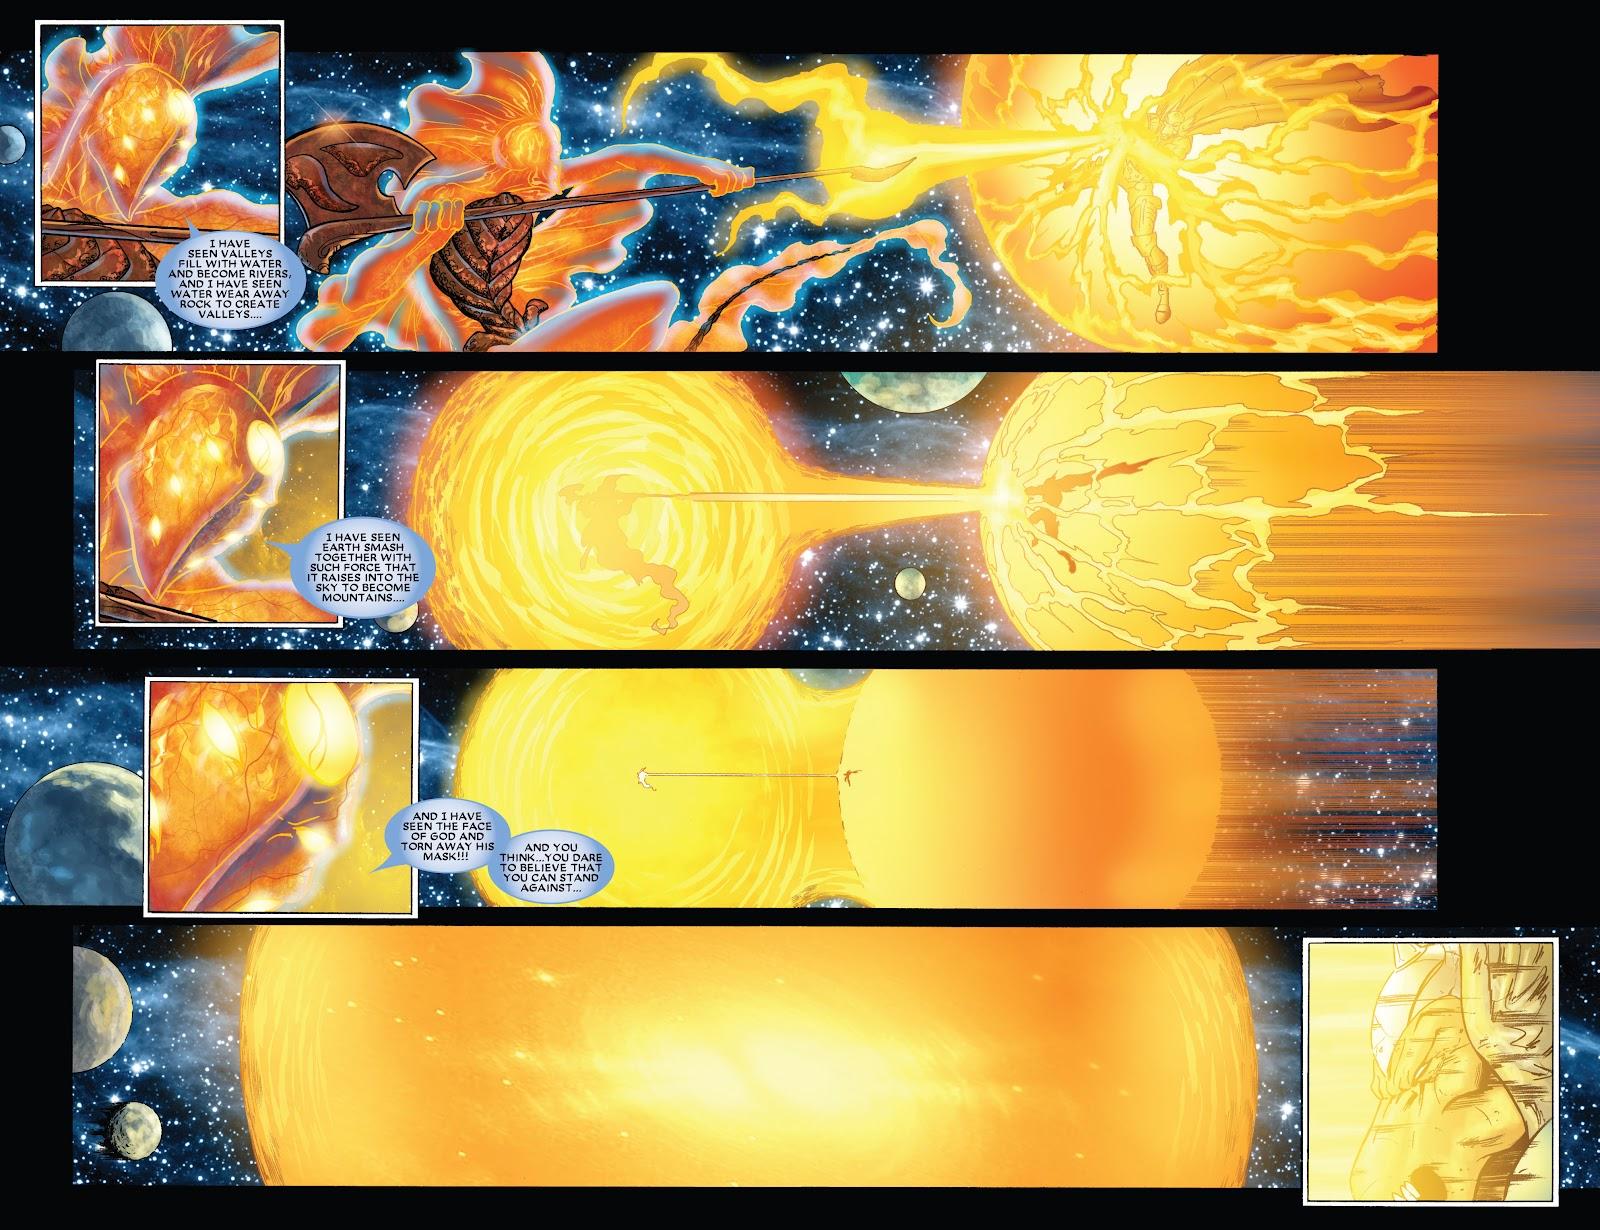 Read online Thor: Ragnaroks comic -  Issue # TPB (Part 4) - 10